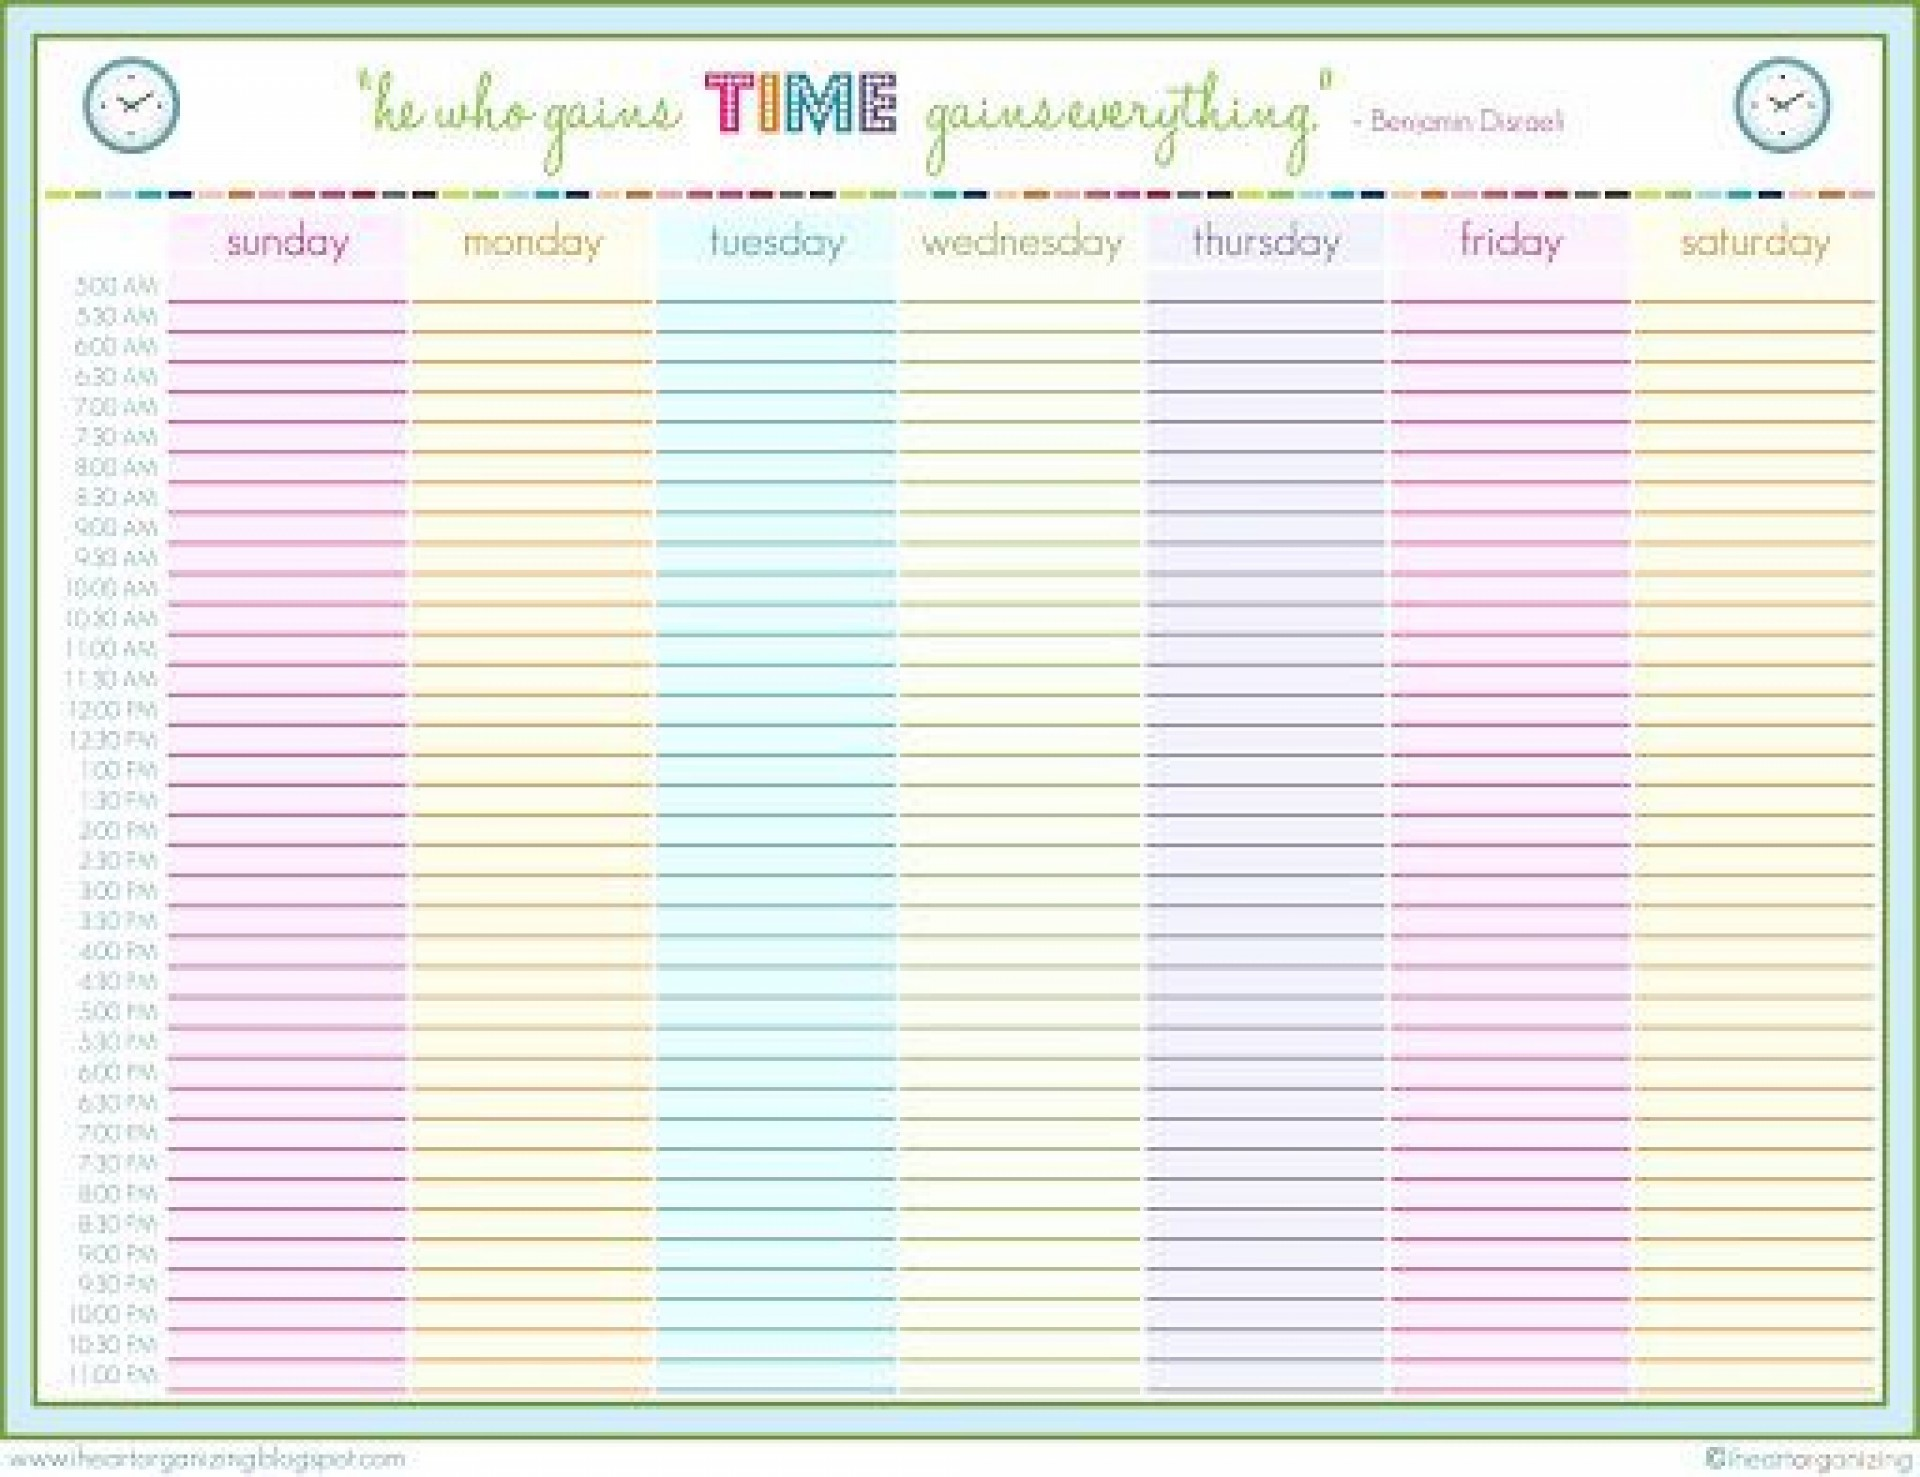 002 Impressive 24 Hour Schedule Template High Def  7 Day Work Calendar Word1920